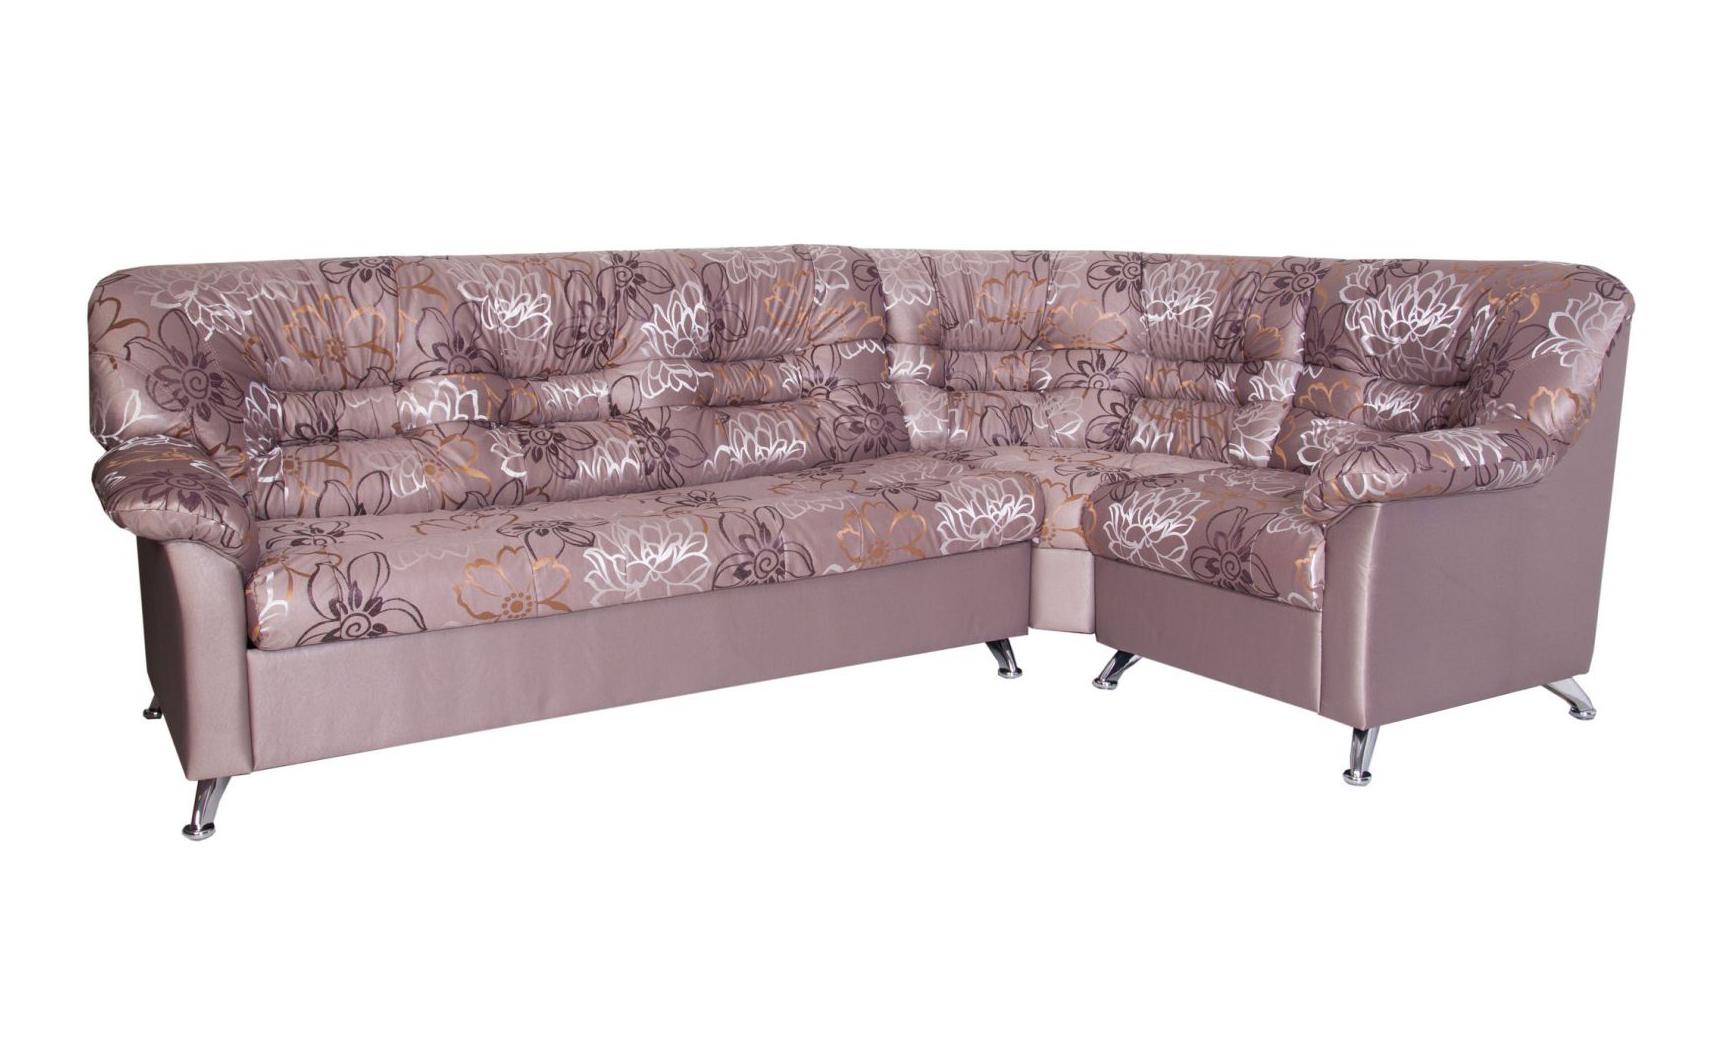 Угловой диван Марсель угловой диван диван ру верона pink flowers